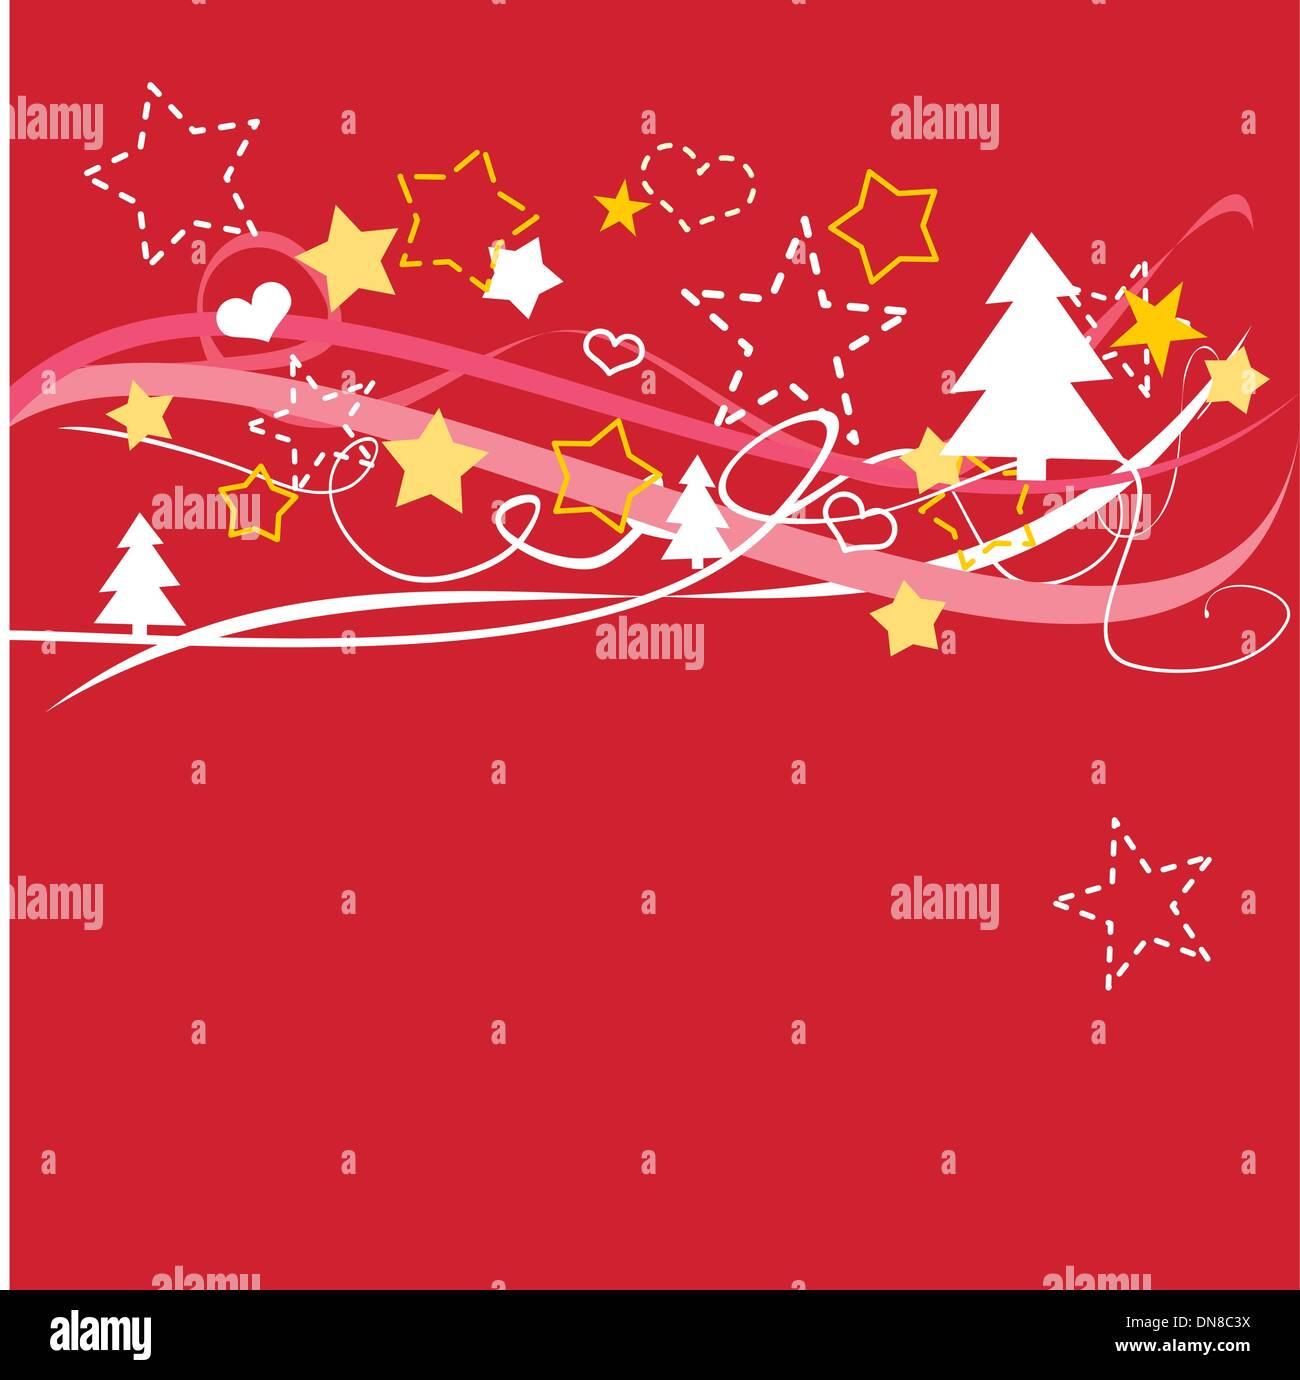 Feliz navidad vector merry christmas card template in spanish christmas vector card or invitation for party with merry christmas wishes in espanol feliz navidad kristyandbryce Images